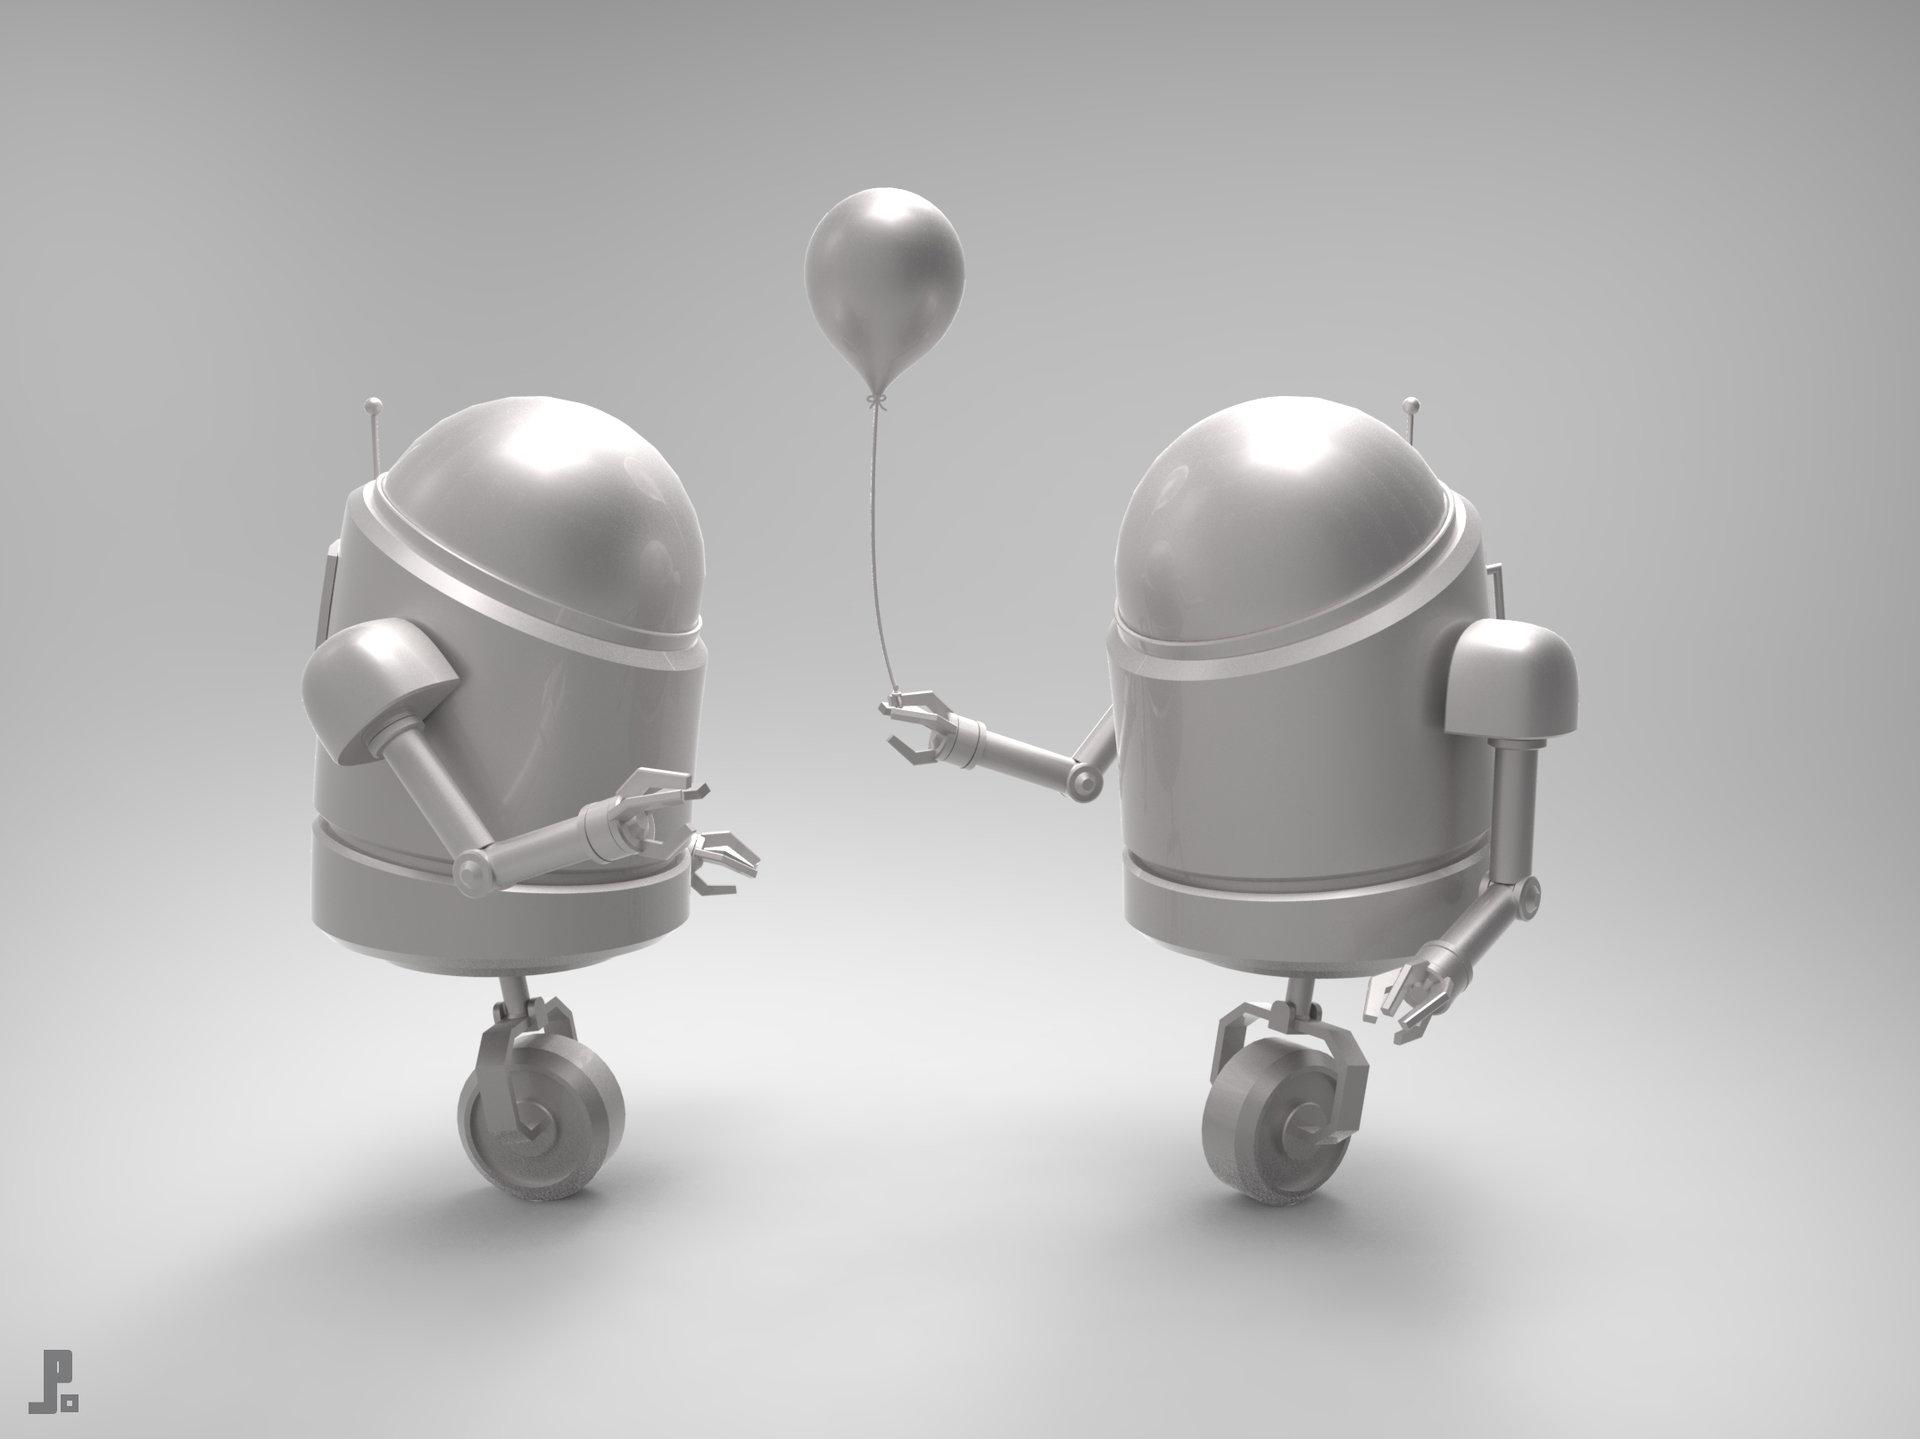 Jarlan perez minibots balloons grey